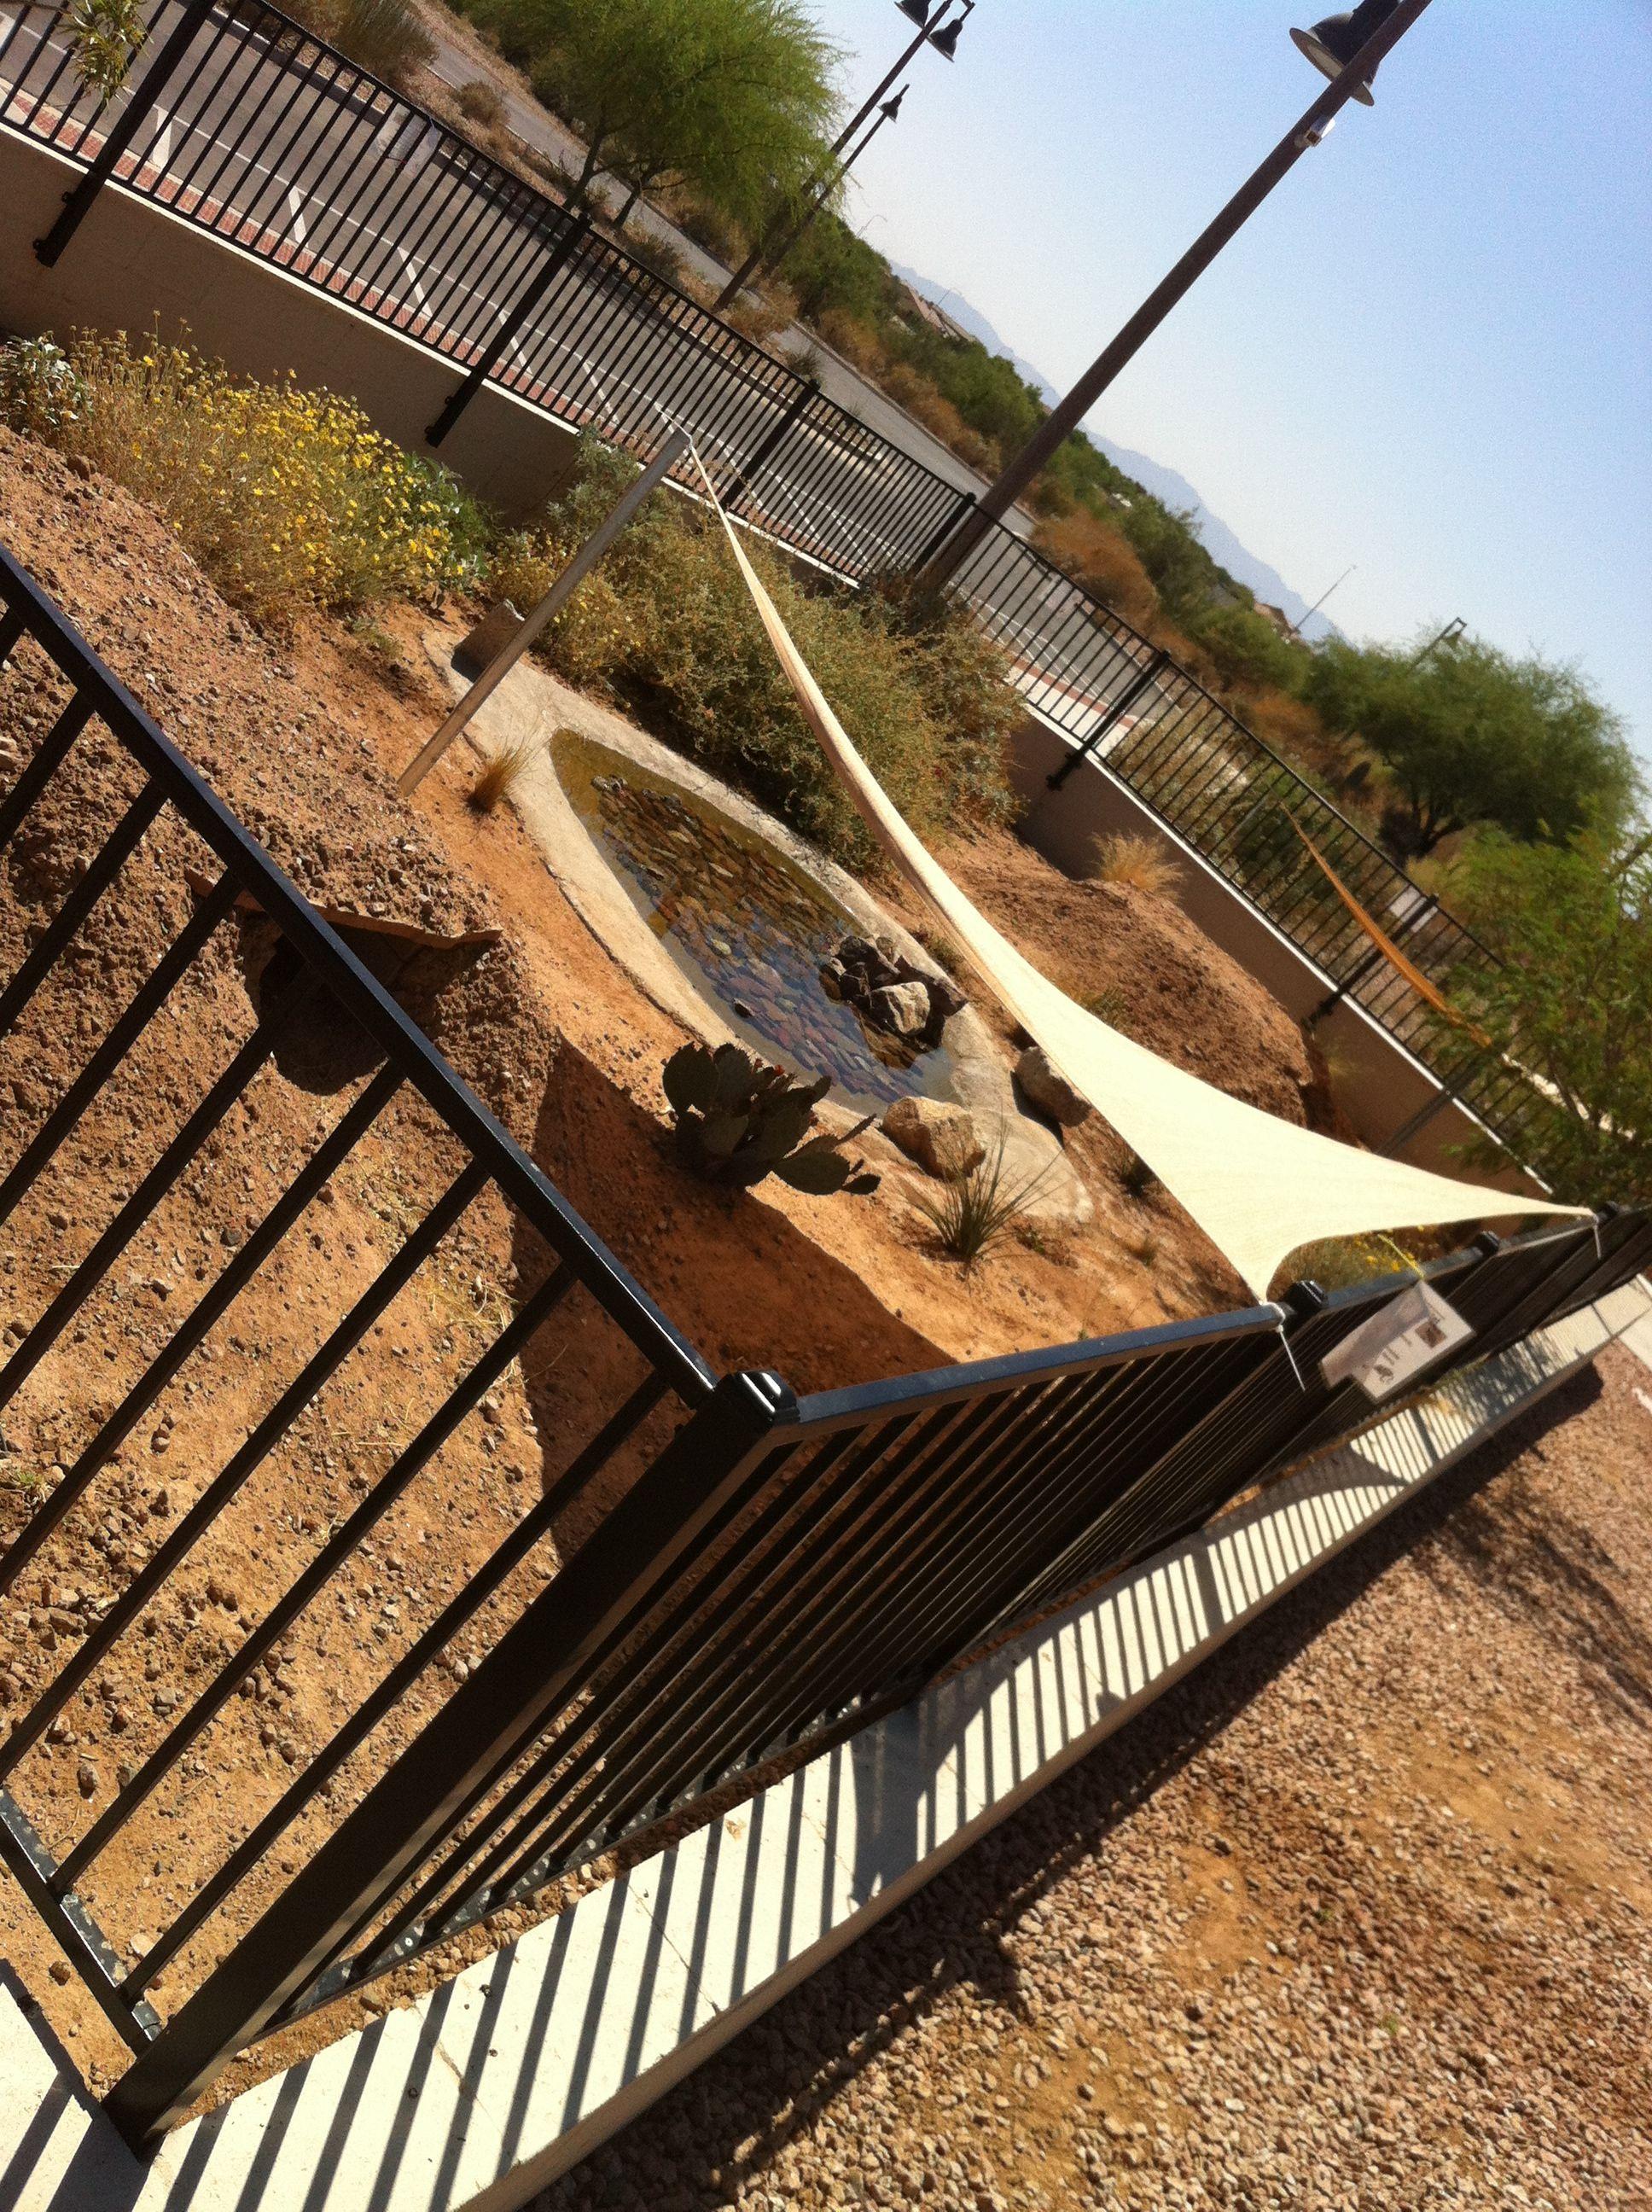 Veteranus oasis park desert tortoise enclosure russian tortoises